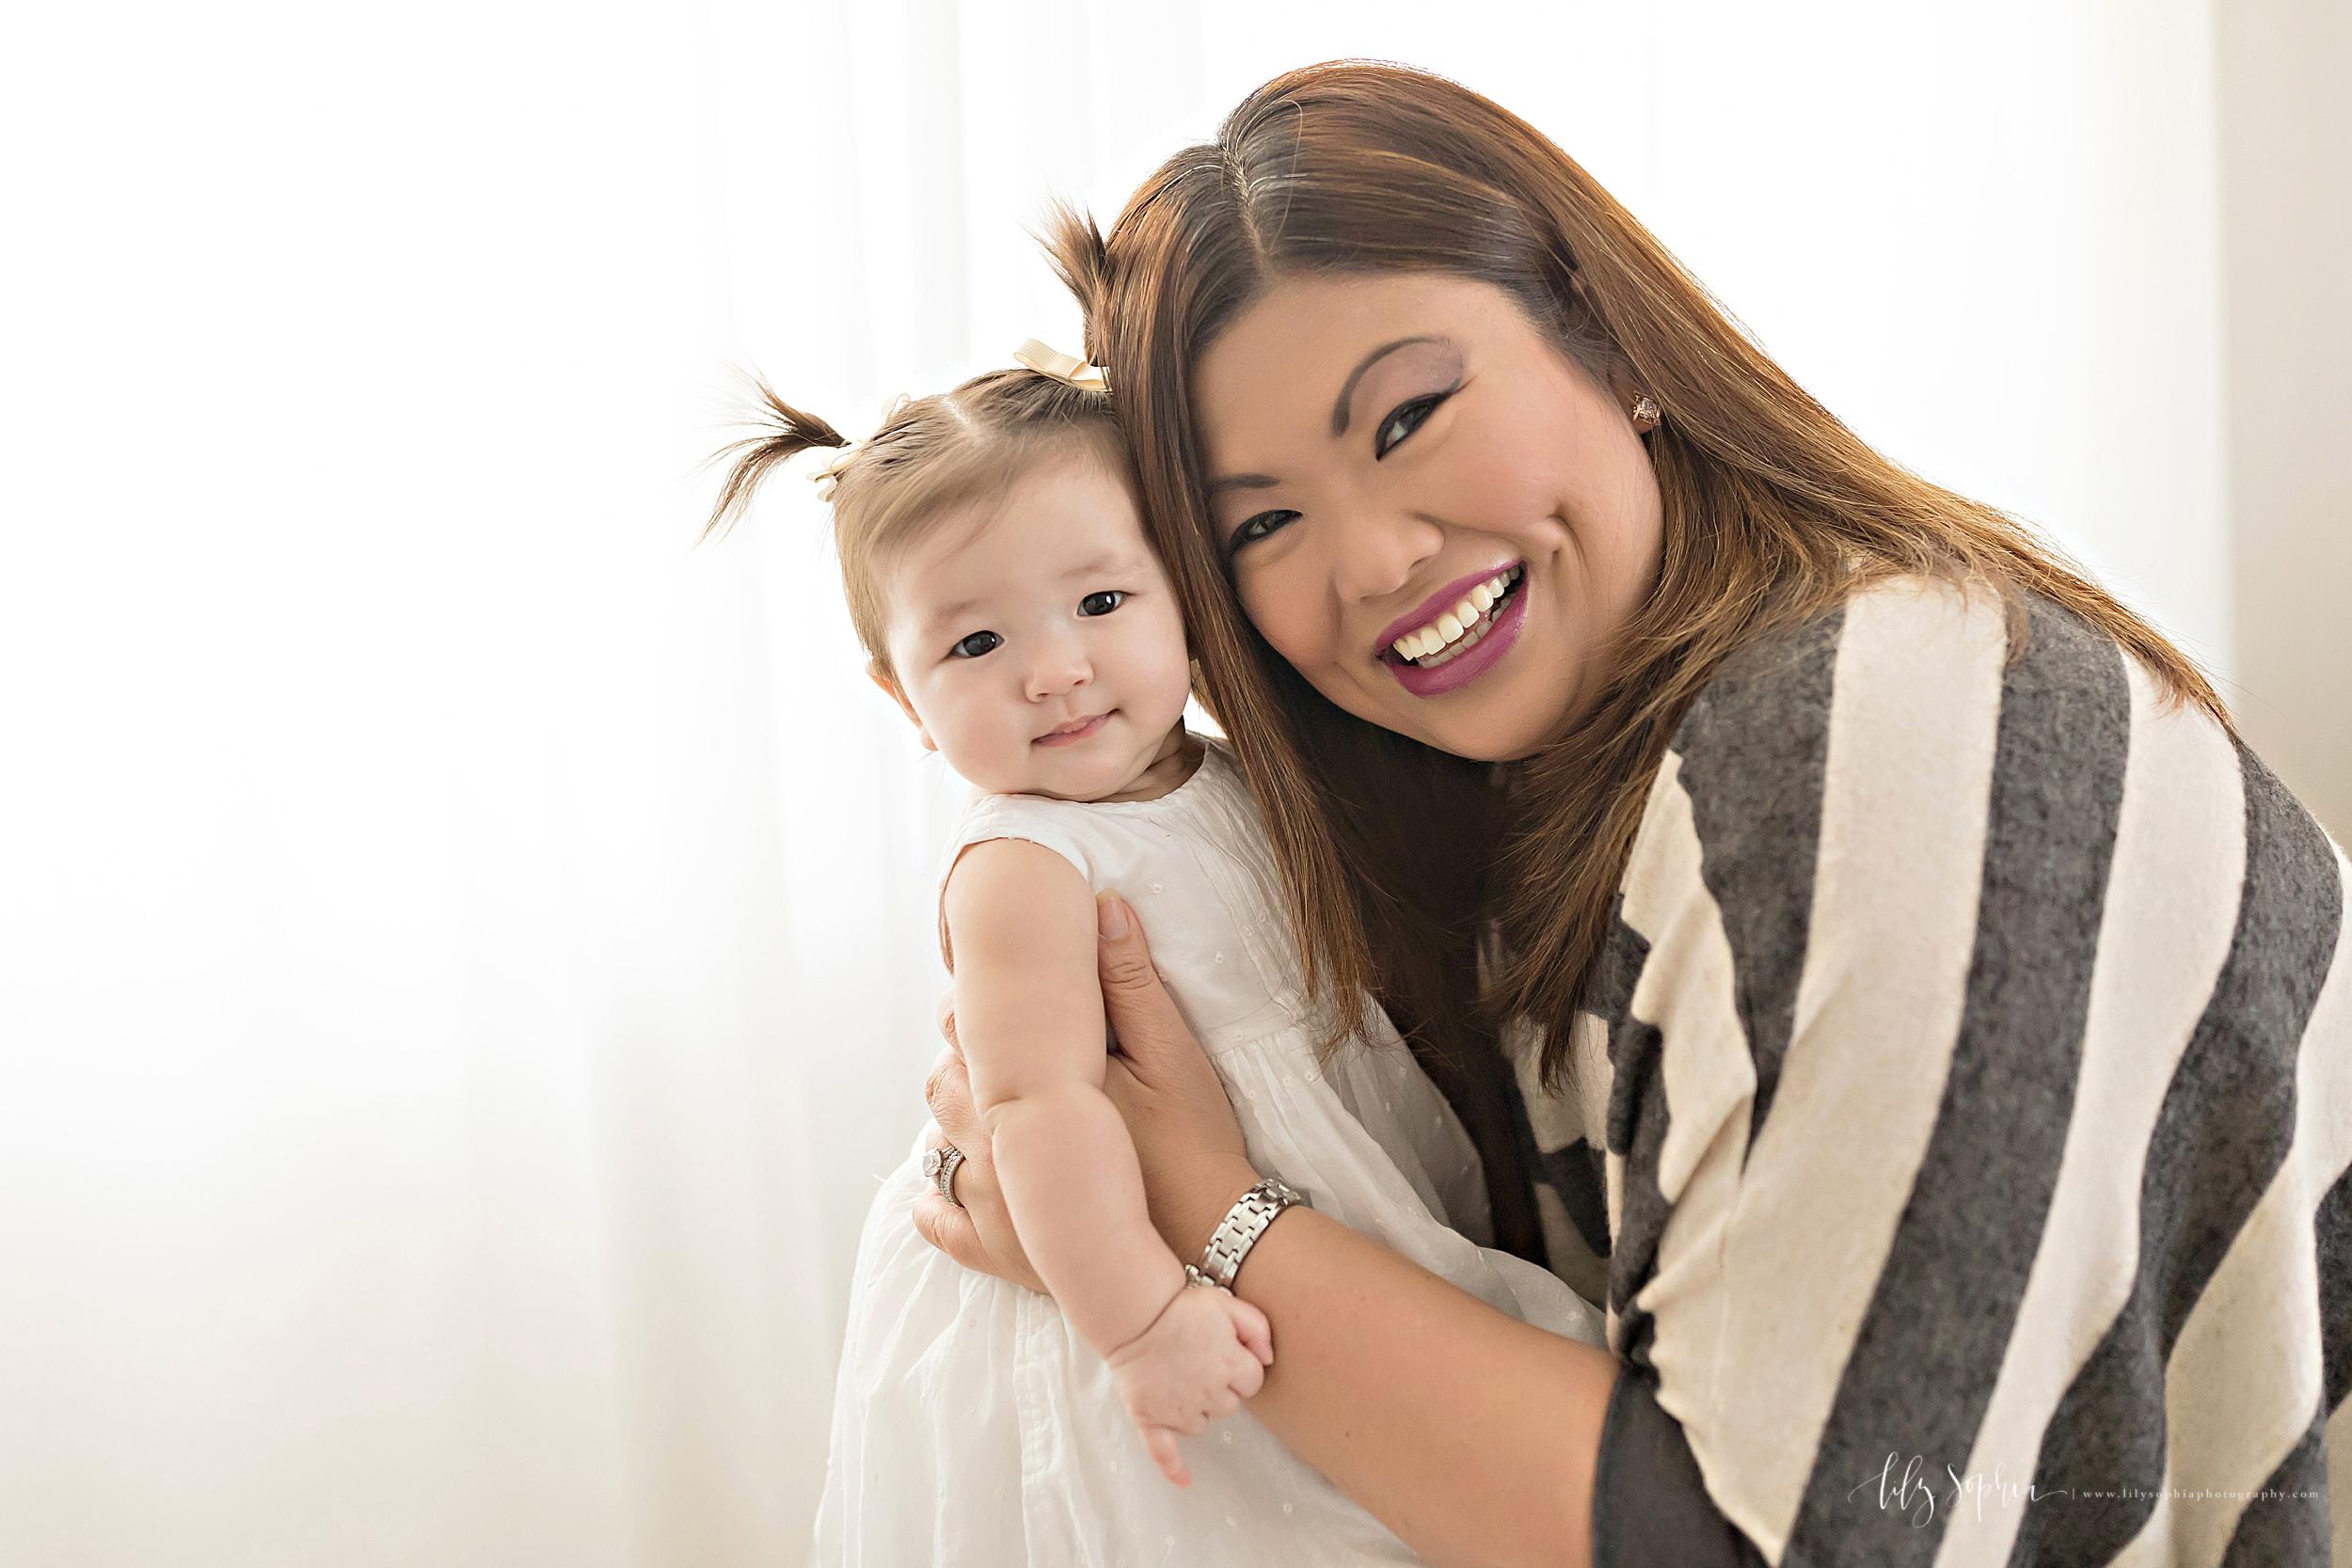 atlanta-midtown-brookhaven-decatur-lily-sophia-photography-photographer-portraits-grant-park-studio-six-month-milestone-baby-girl-big-sister-family_0110.jpg